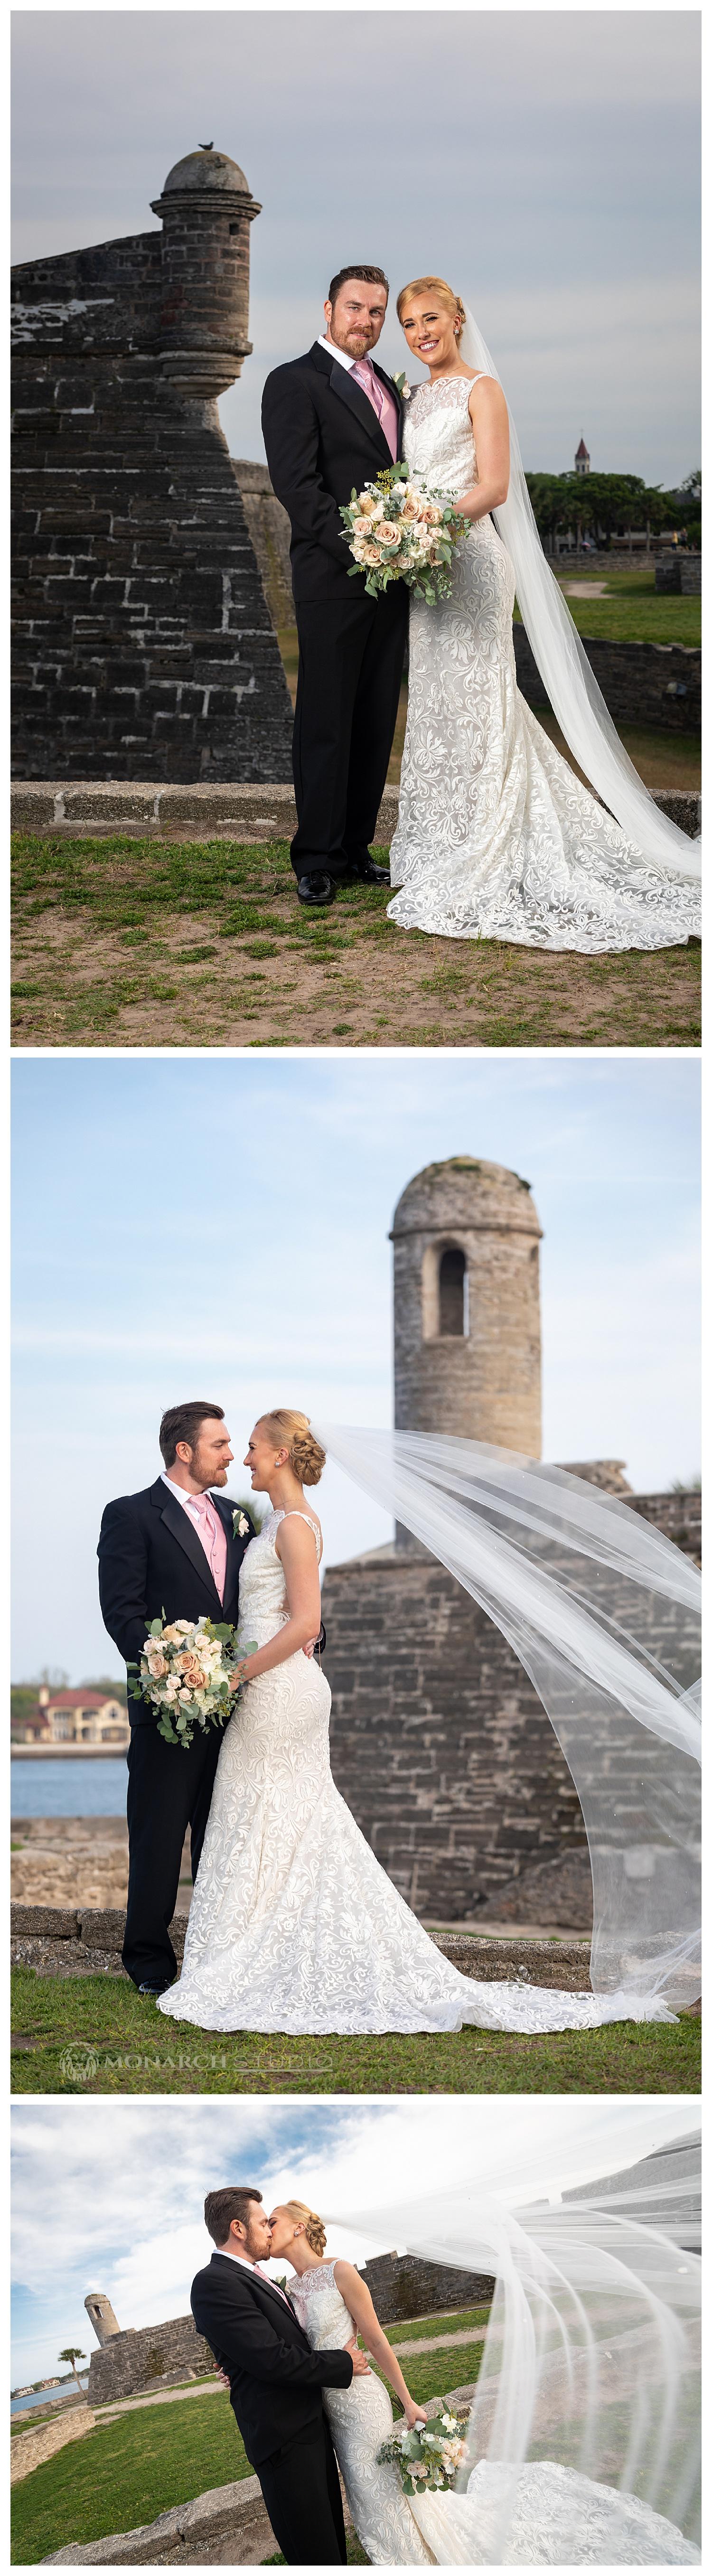 St. Augustine Wedding - Amore Wedding Chapel - 049.JPG